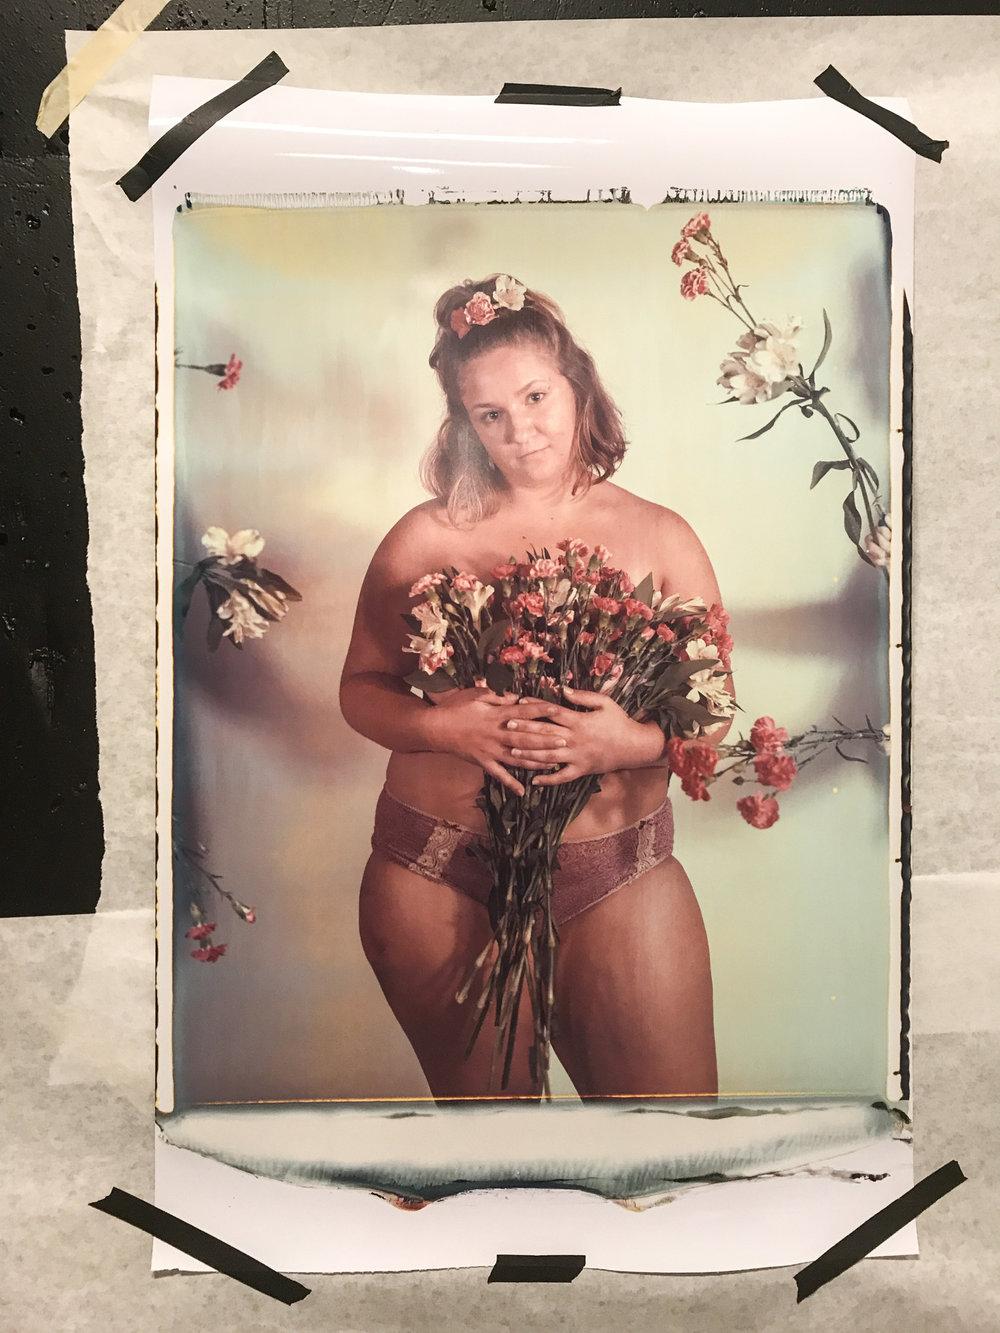 Lena_Mirisola_Polaroid_-5.jpg